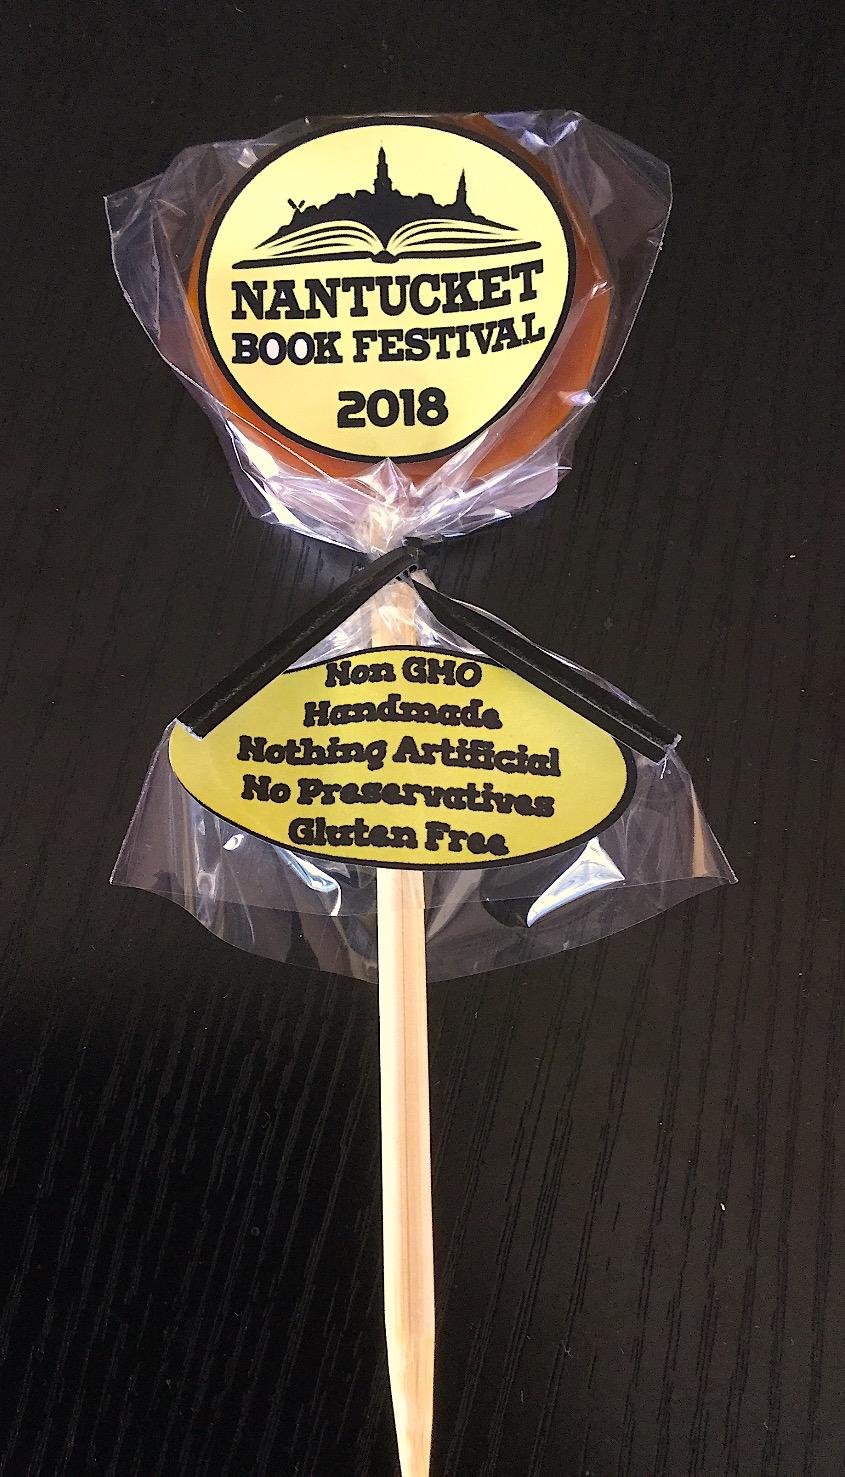 Book Festival Caramel Pop